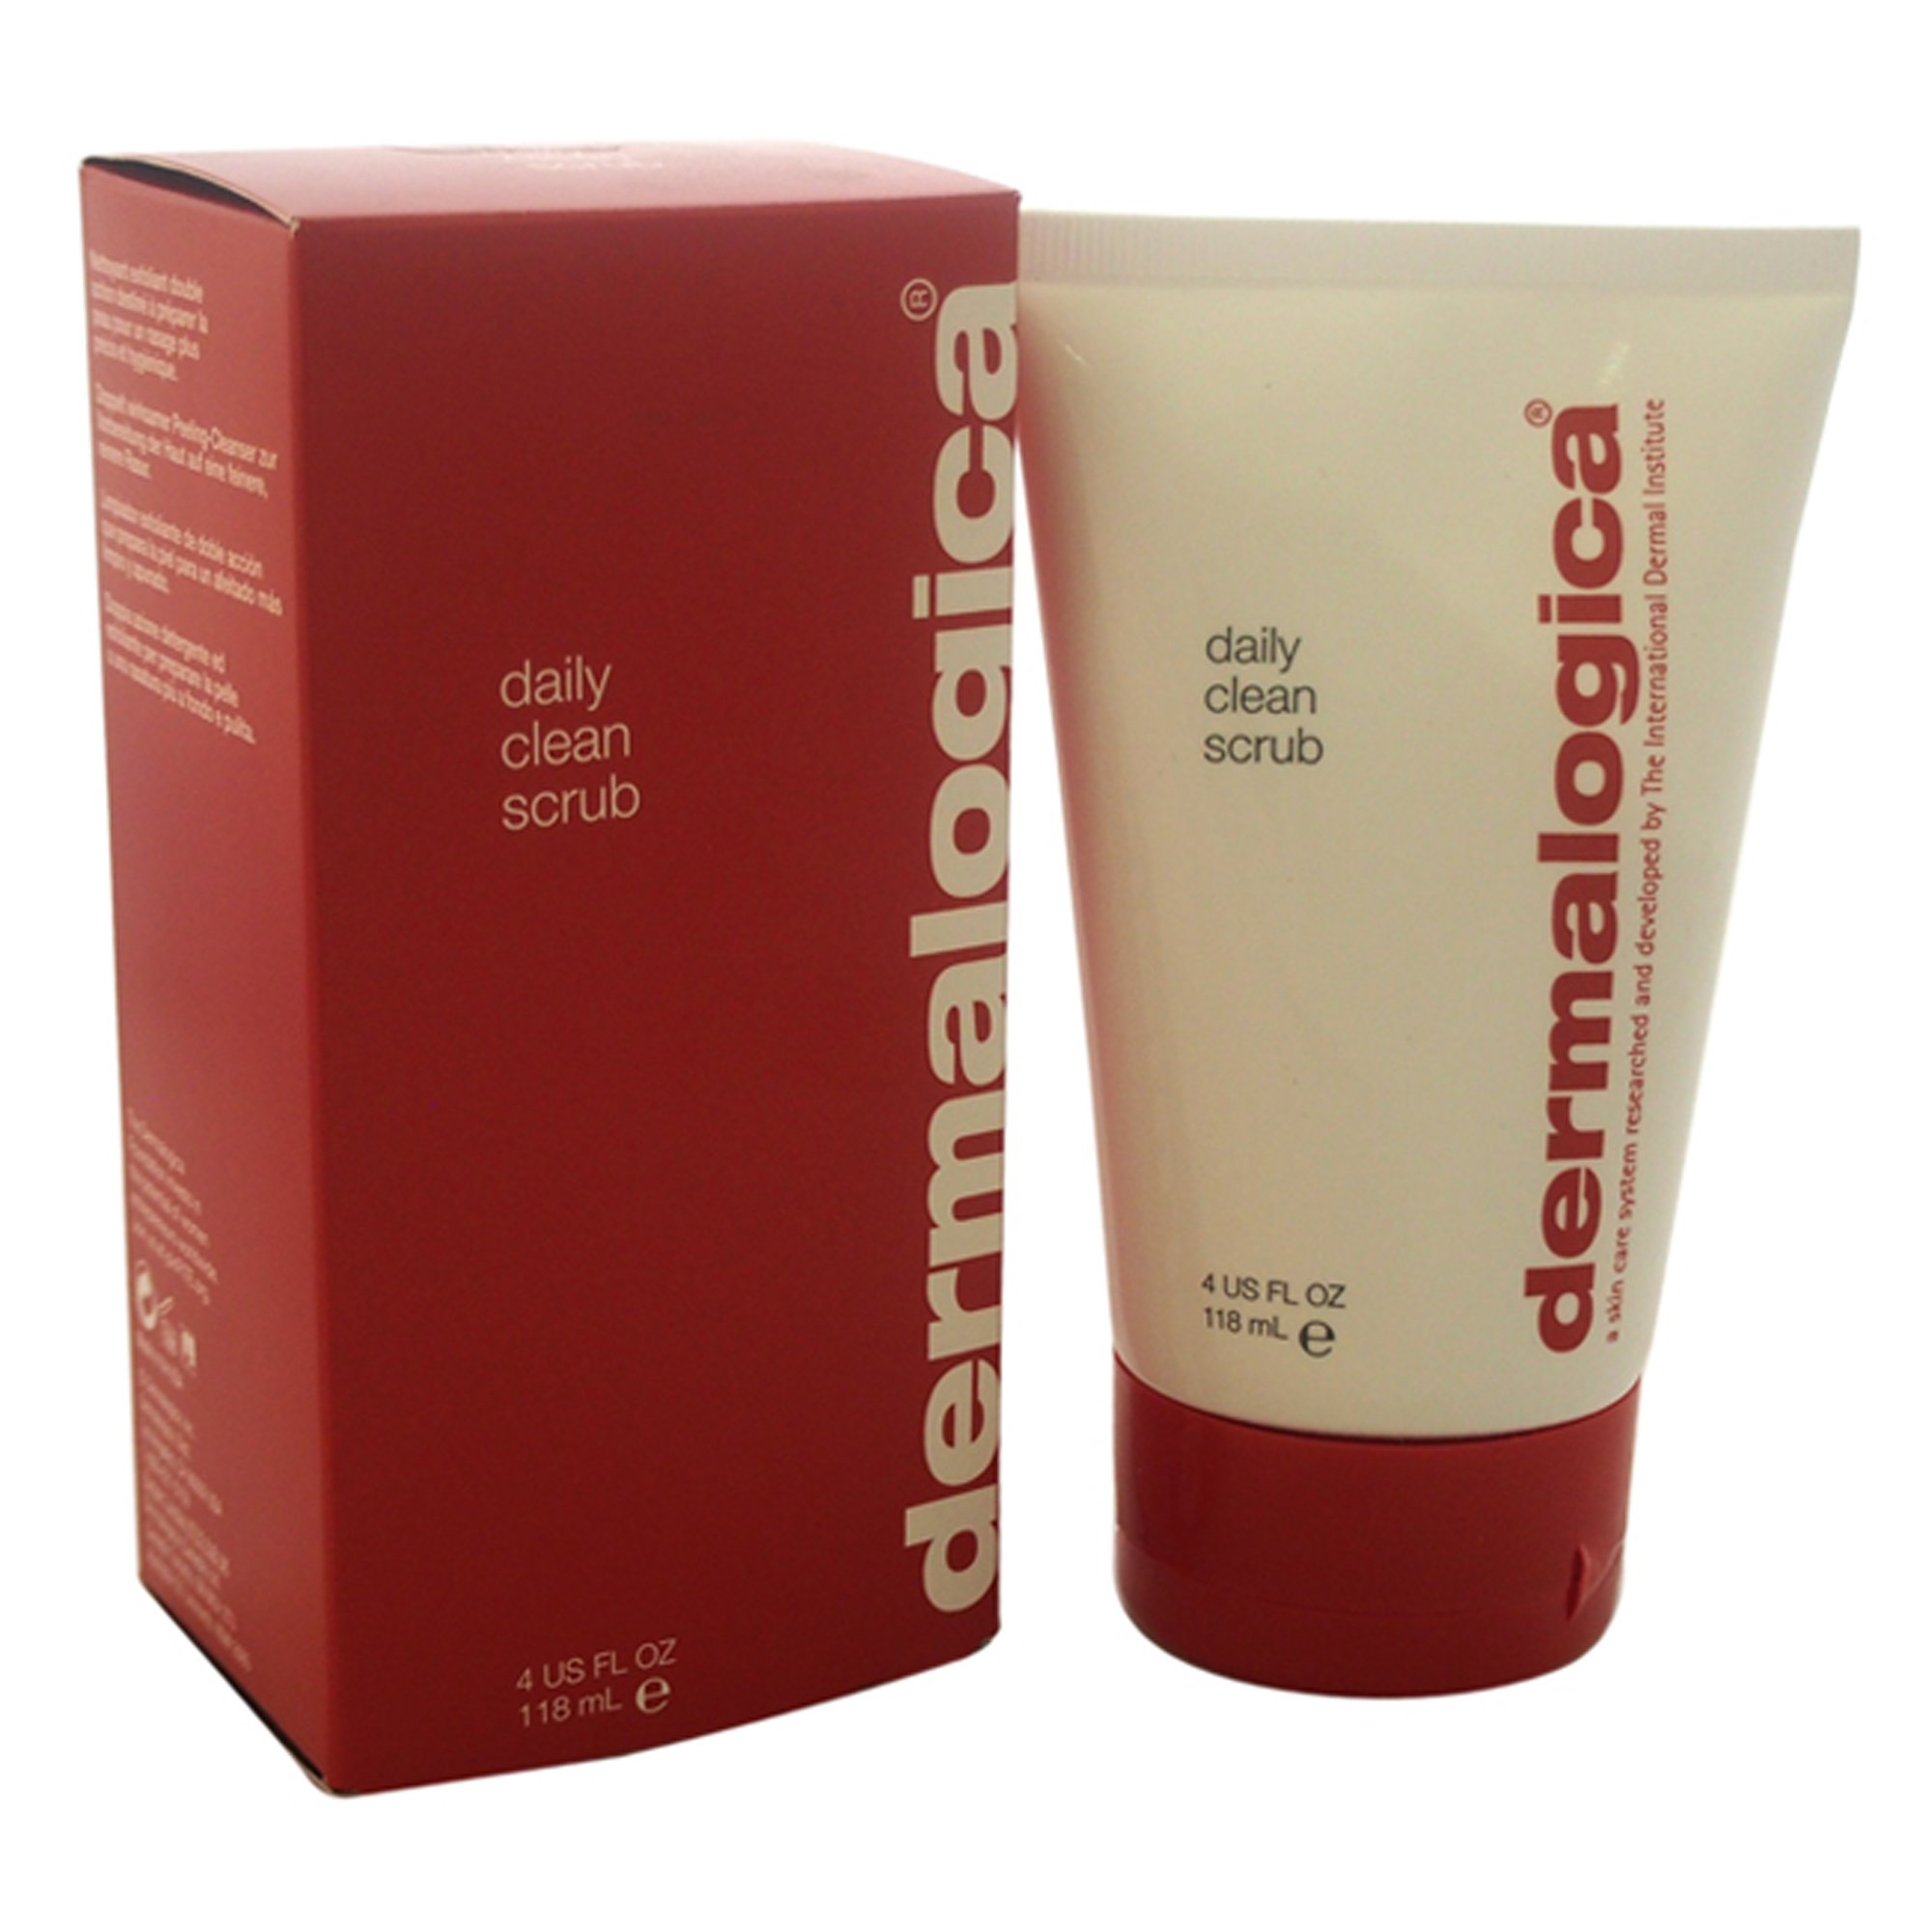 Dermalogica Daily Clean Scrub, 4 Fluid Ounce